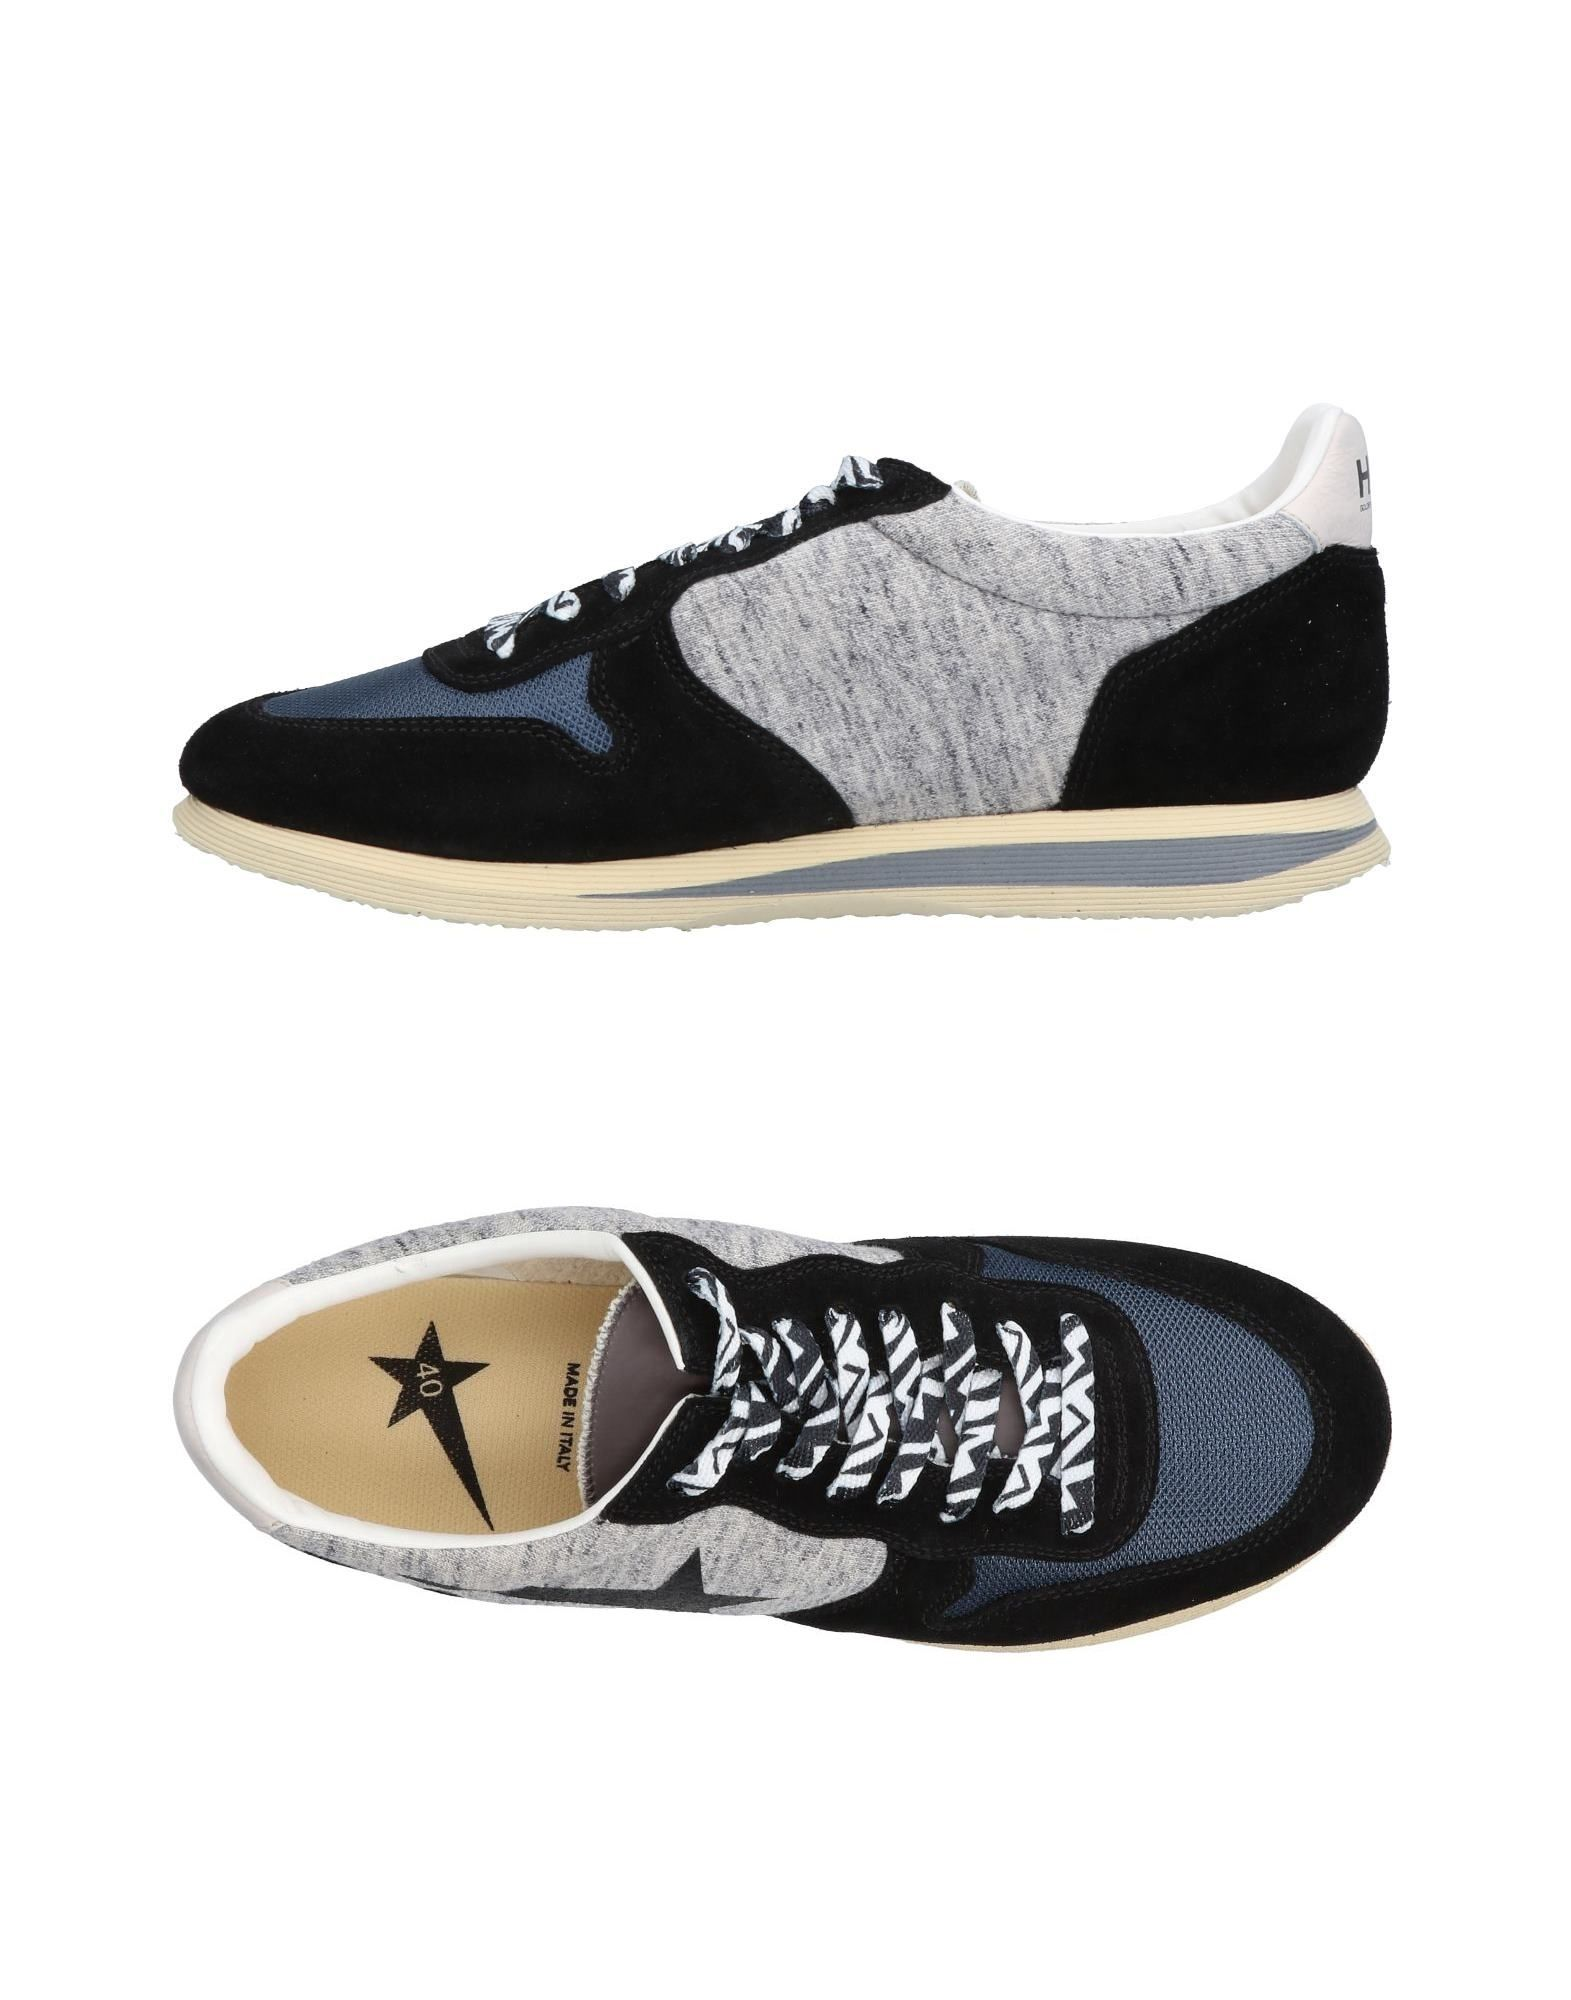 Sneakers Haus Golden Goose Uomo - 11469941QJ 11469941QJ - 0a9fe4